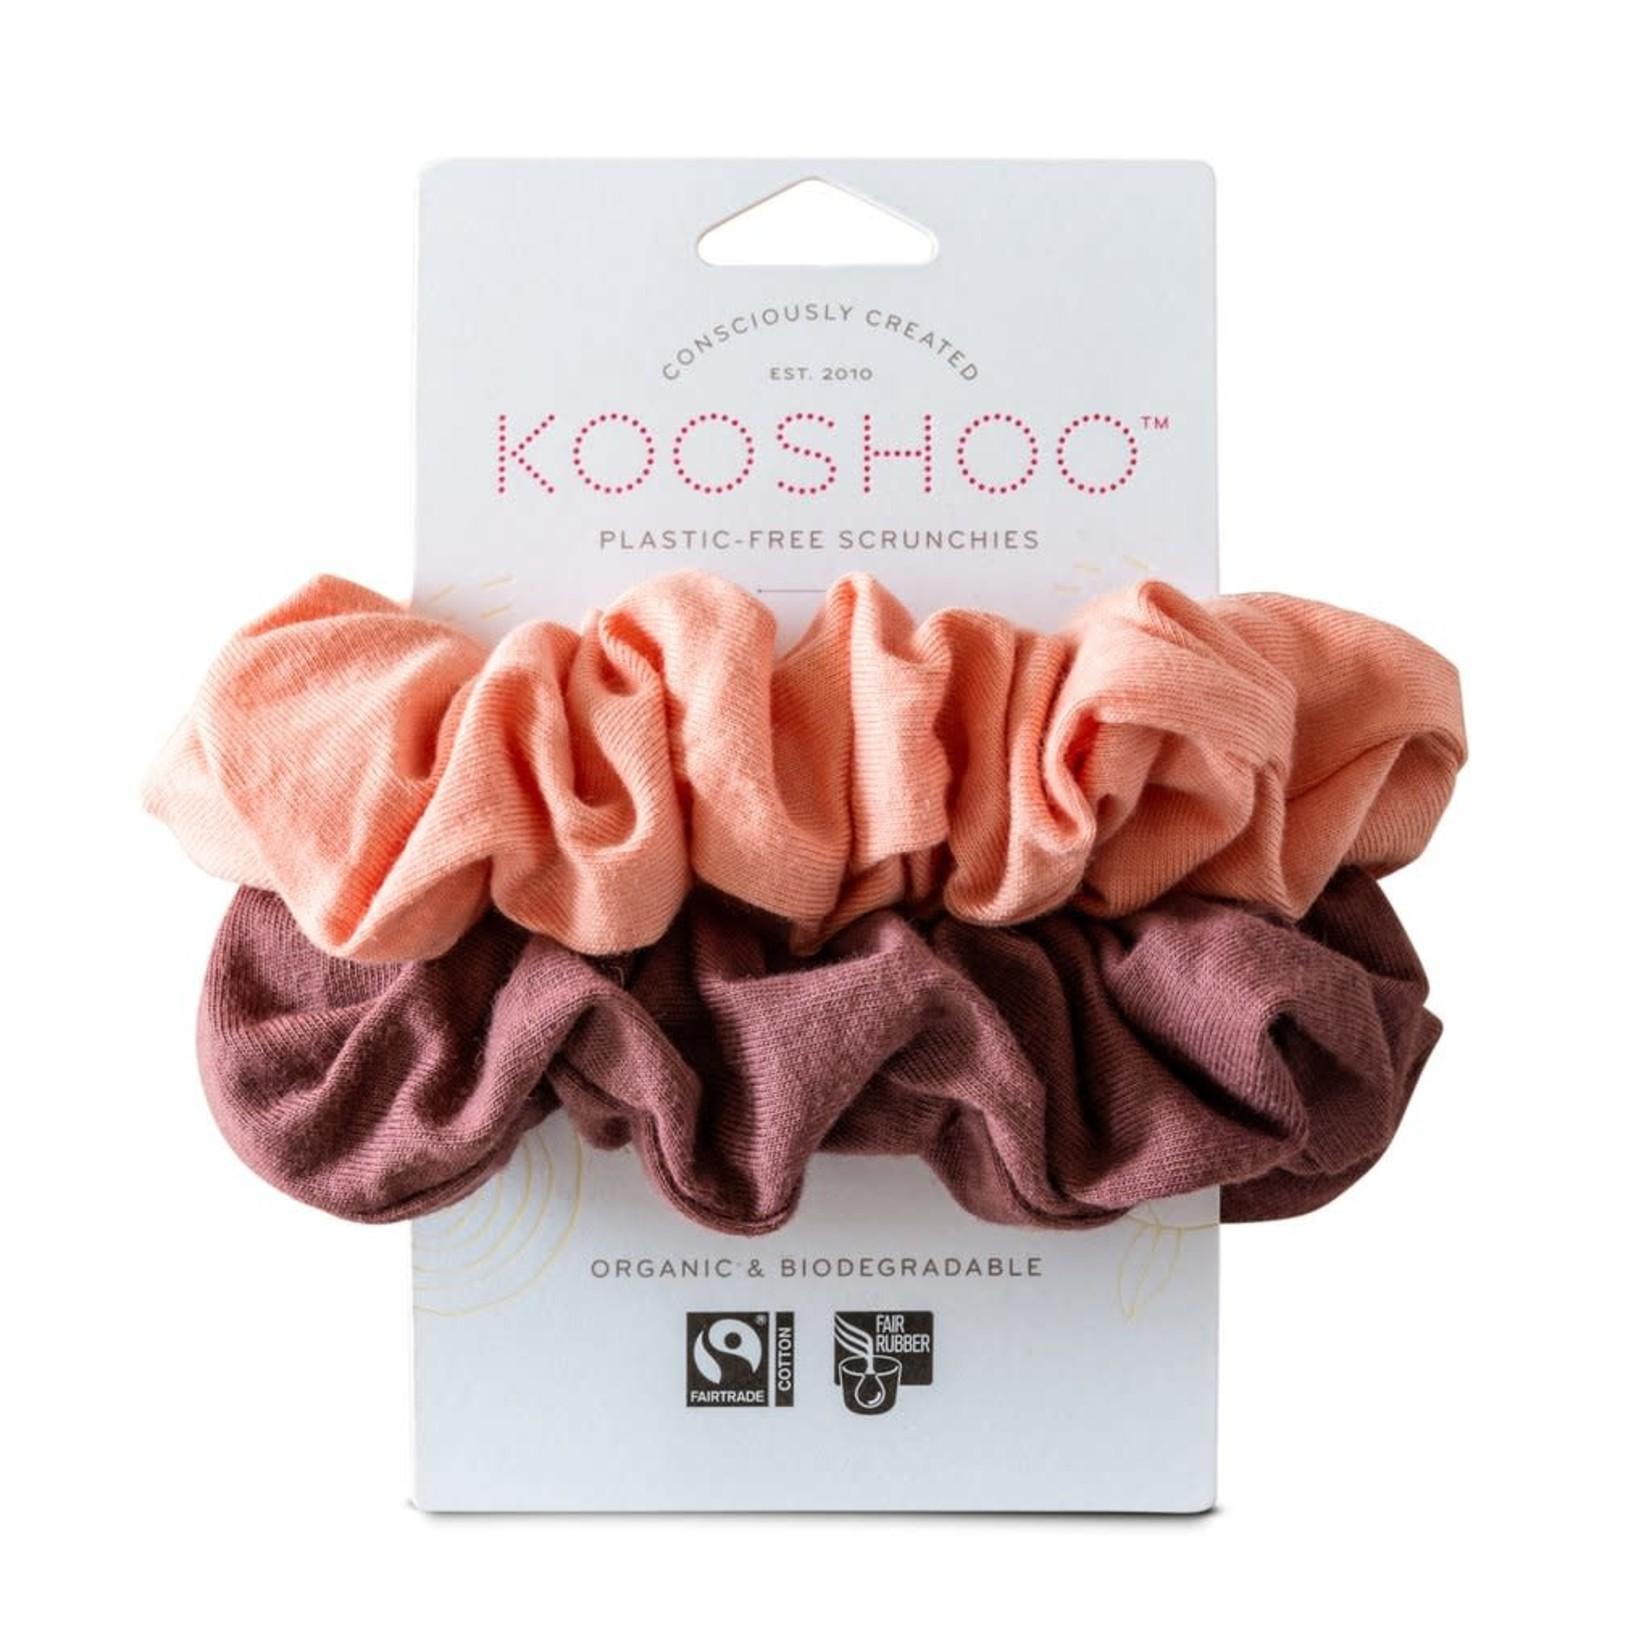 KOOSHOO ORGANIC SCRUNCHIES - CORAL ROSE